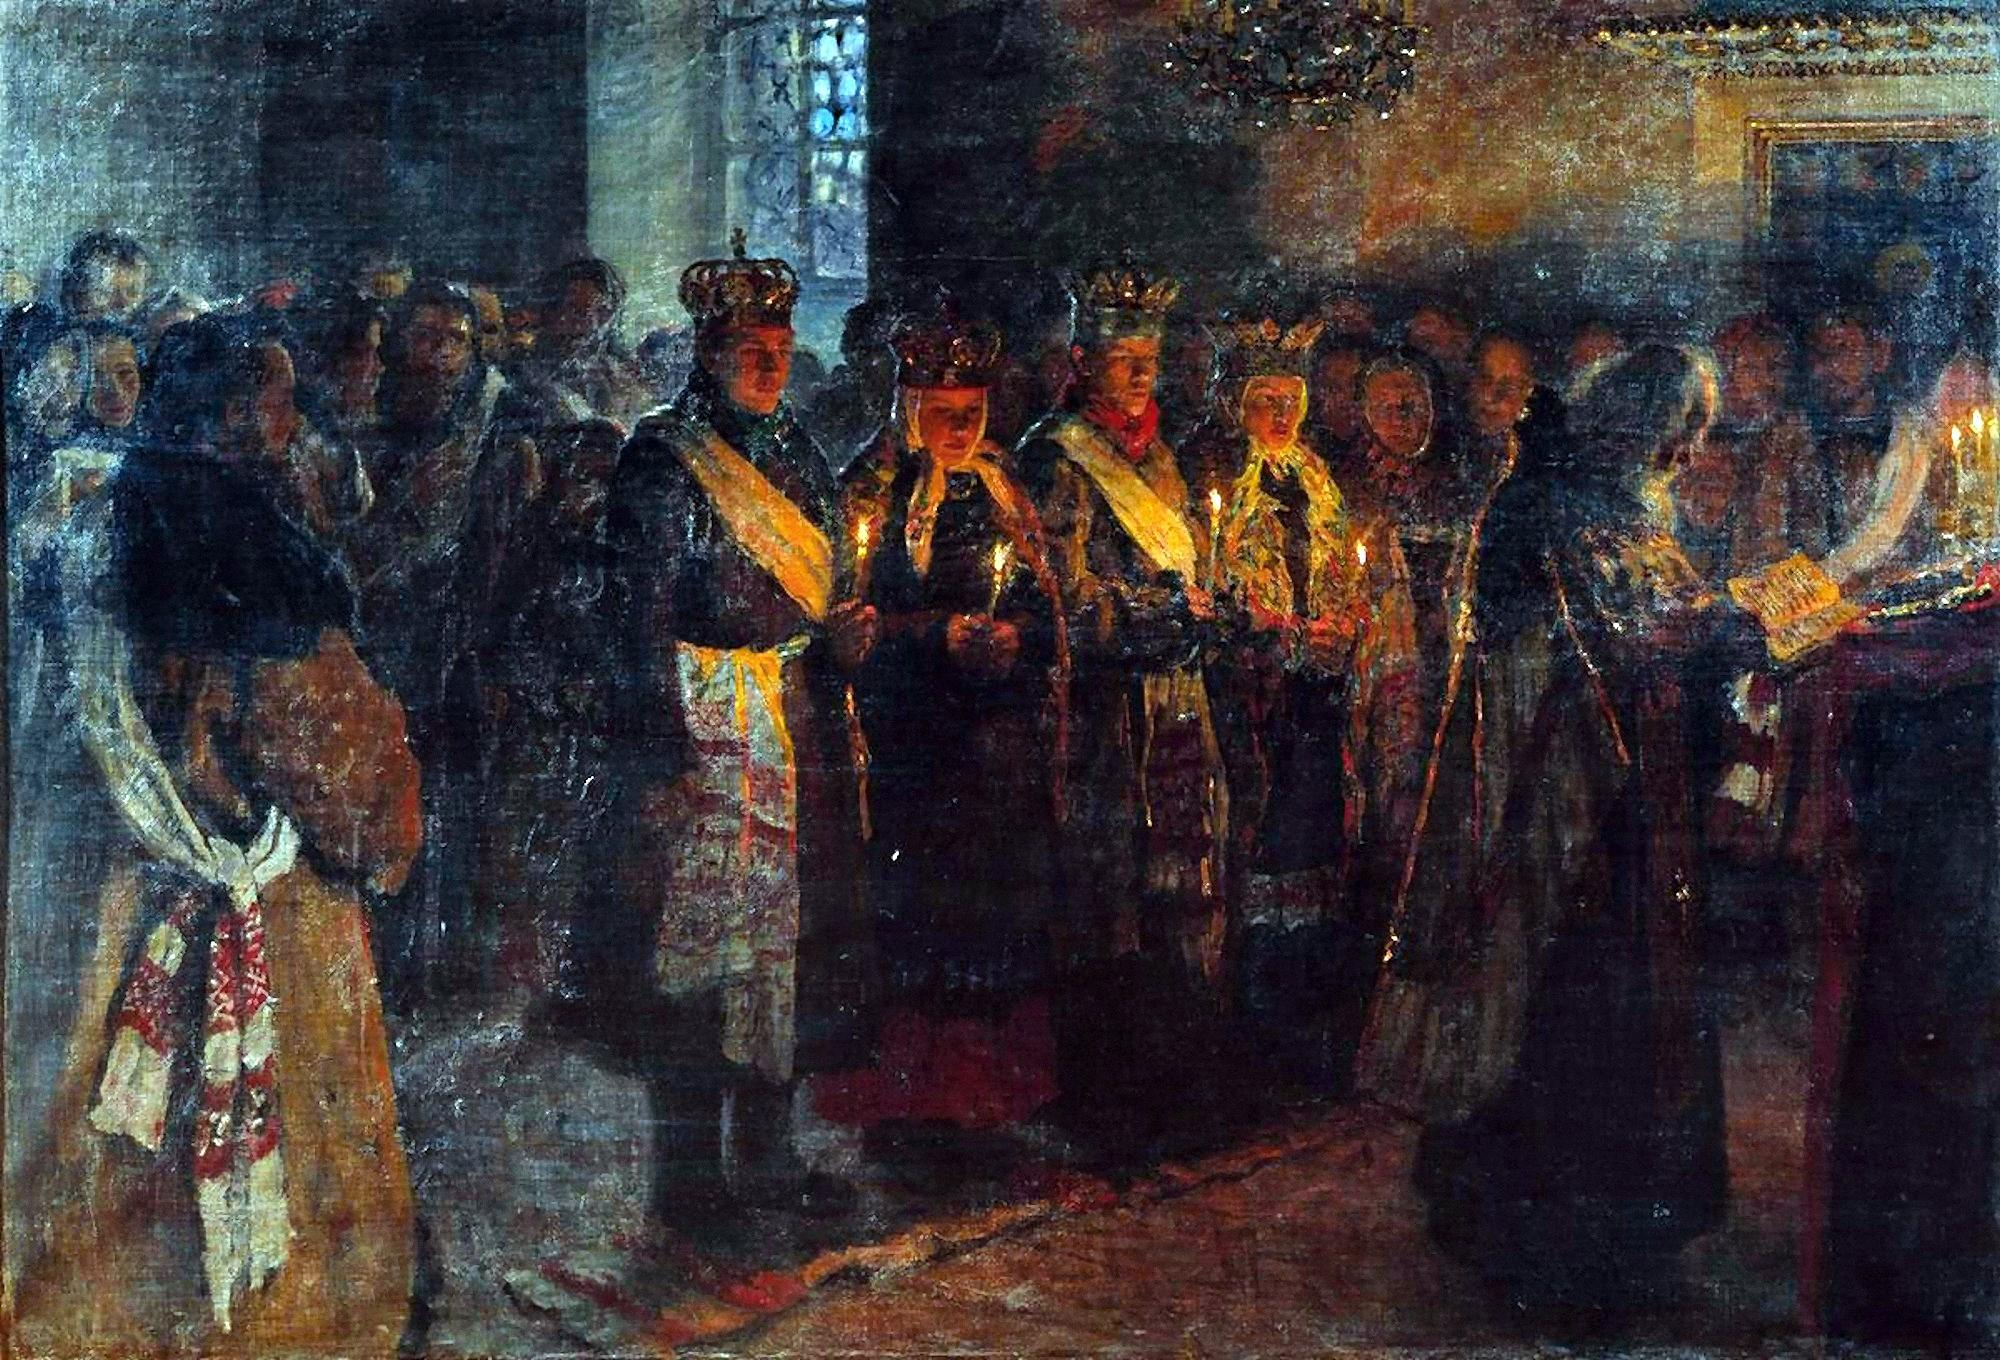 00 Nikolai Bogdanov-Belsky. A Wedding. 1904